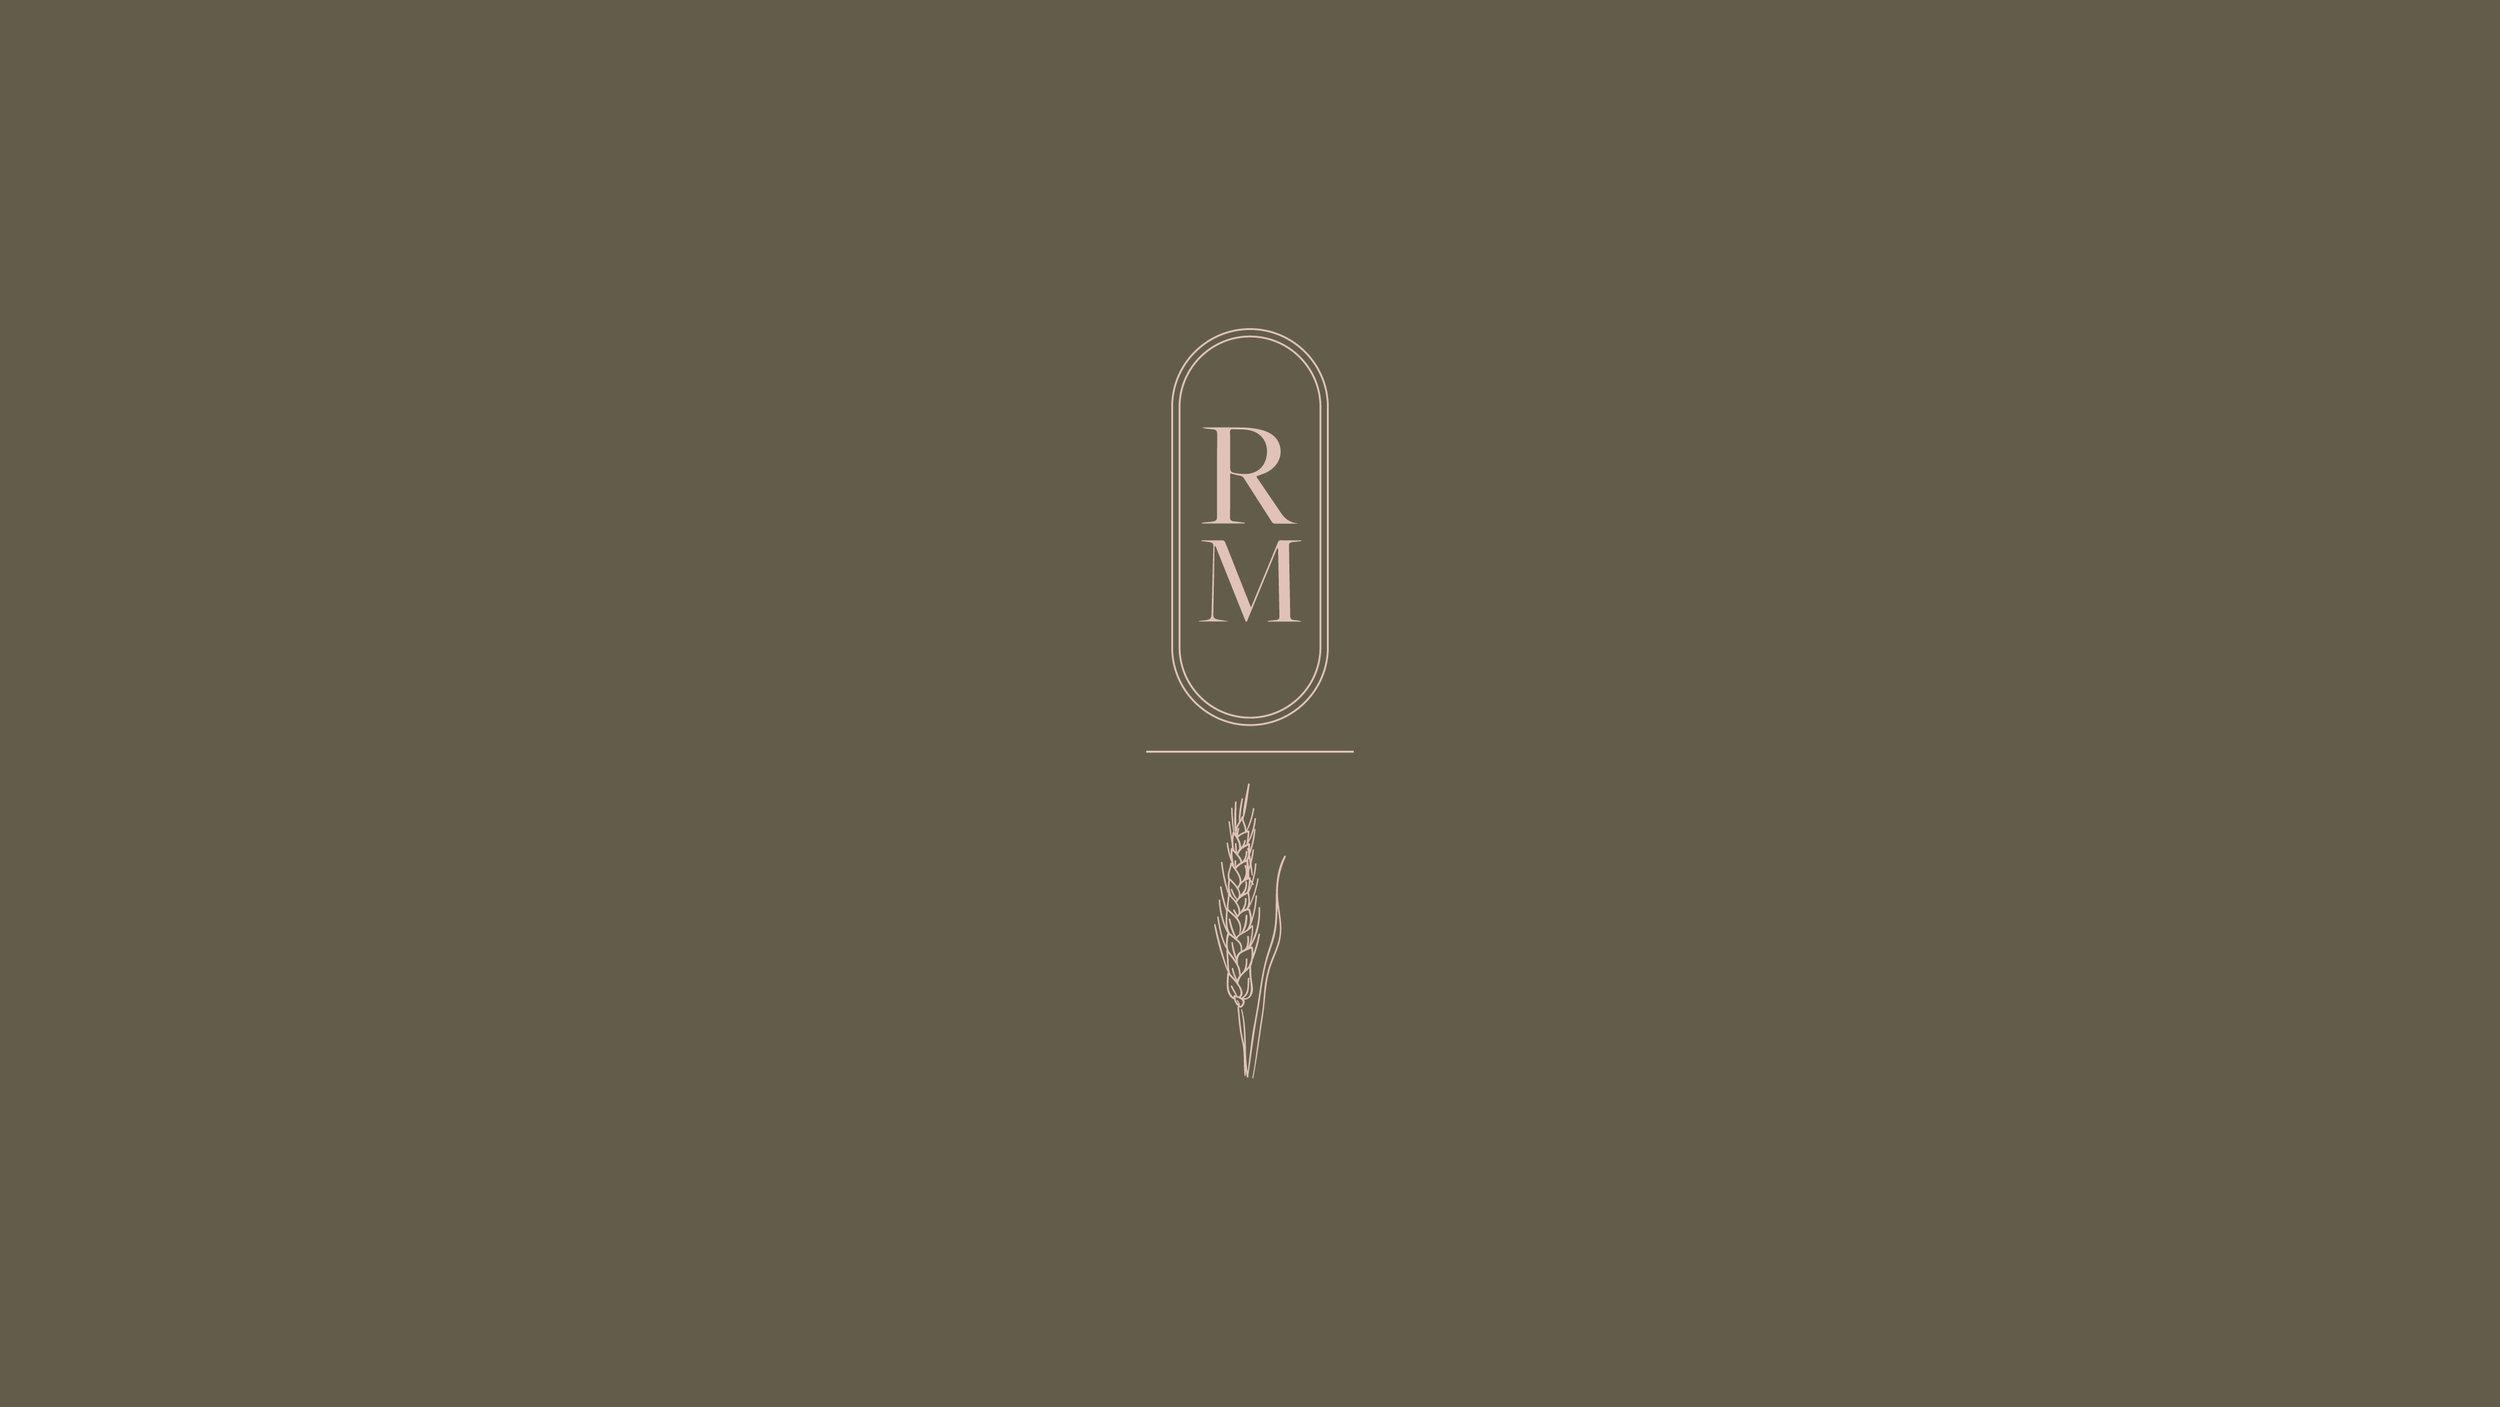 RM clr_logo 2 copy.jpg